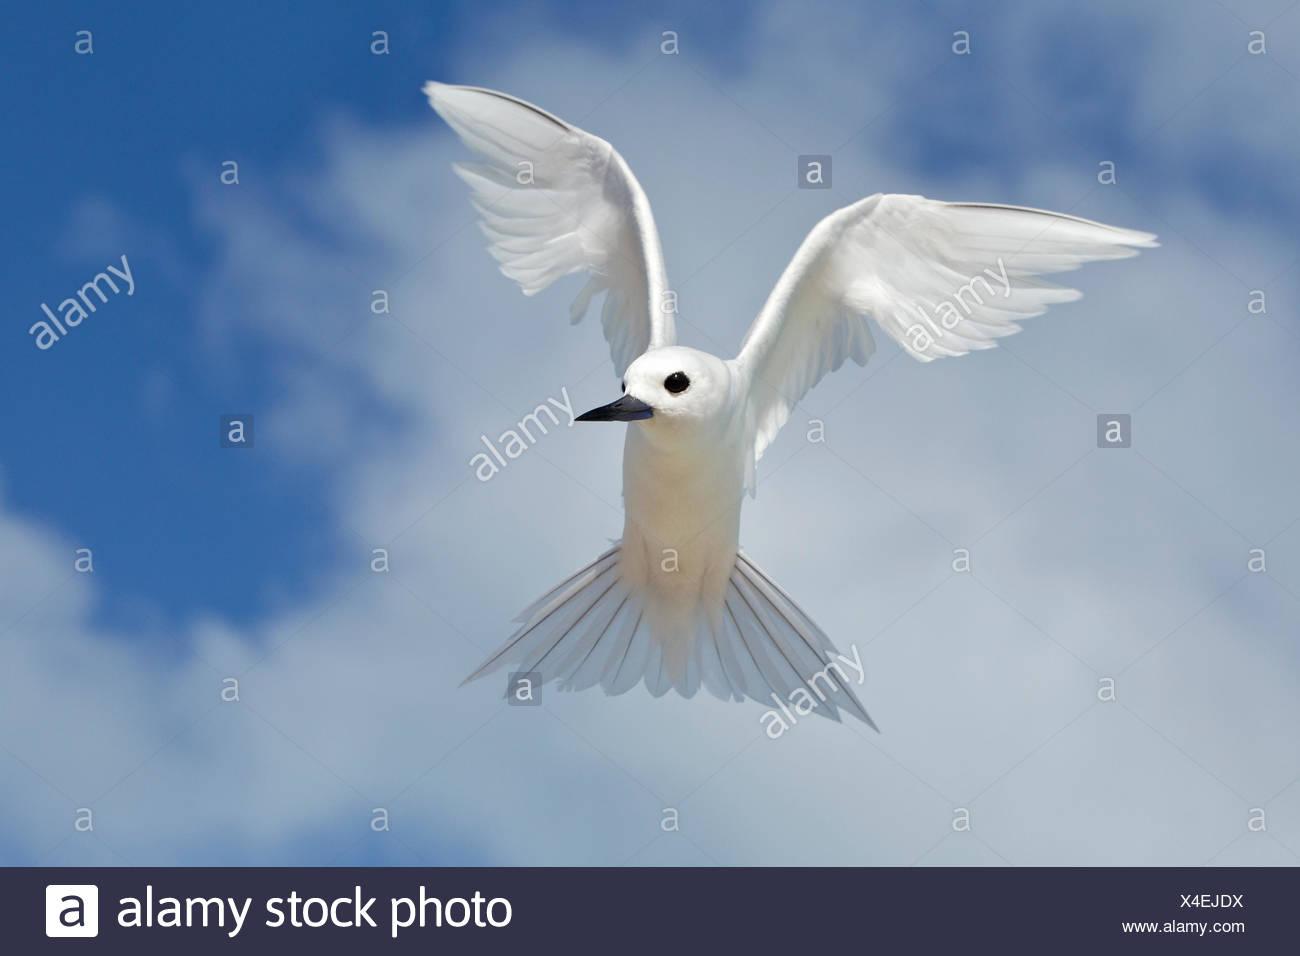 White tern (Gygis alba rothschildi), hovering, Sand Island, Midway Atoll National Wildlife Refuge, Northwest Hawaiian Islands. - Stock Image